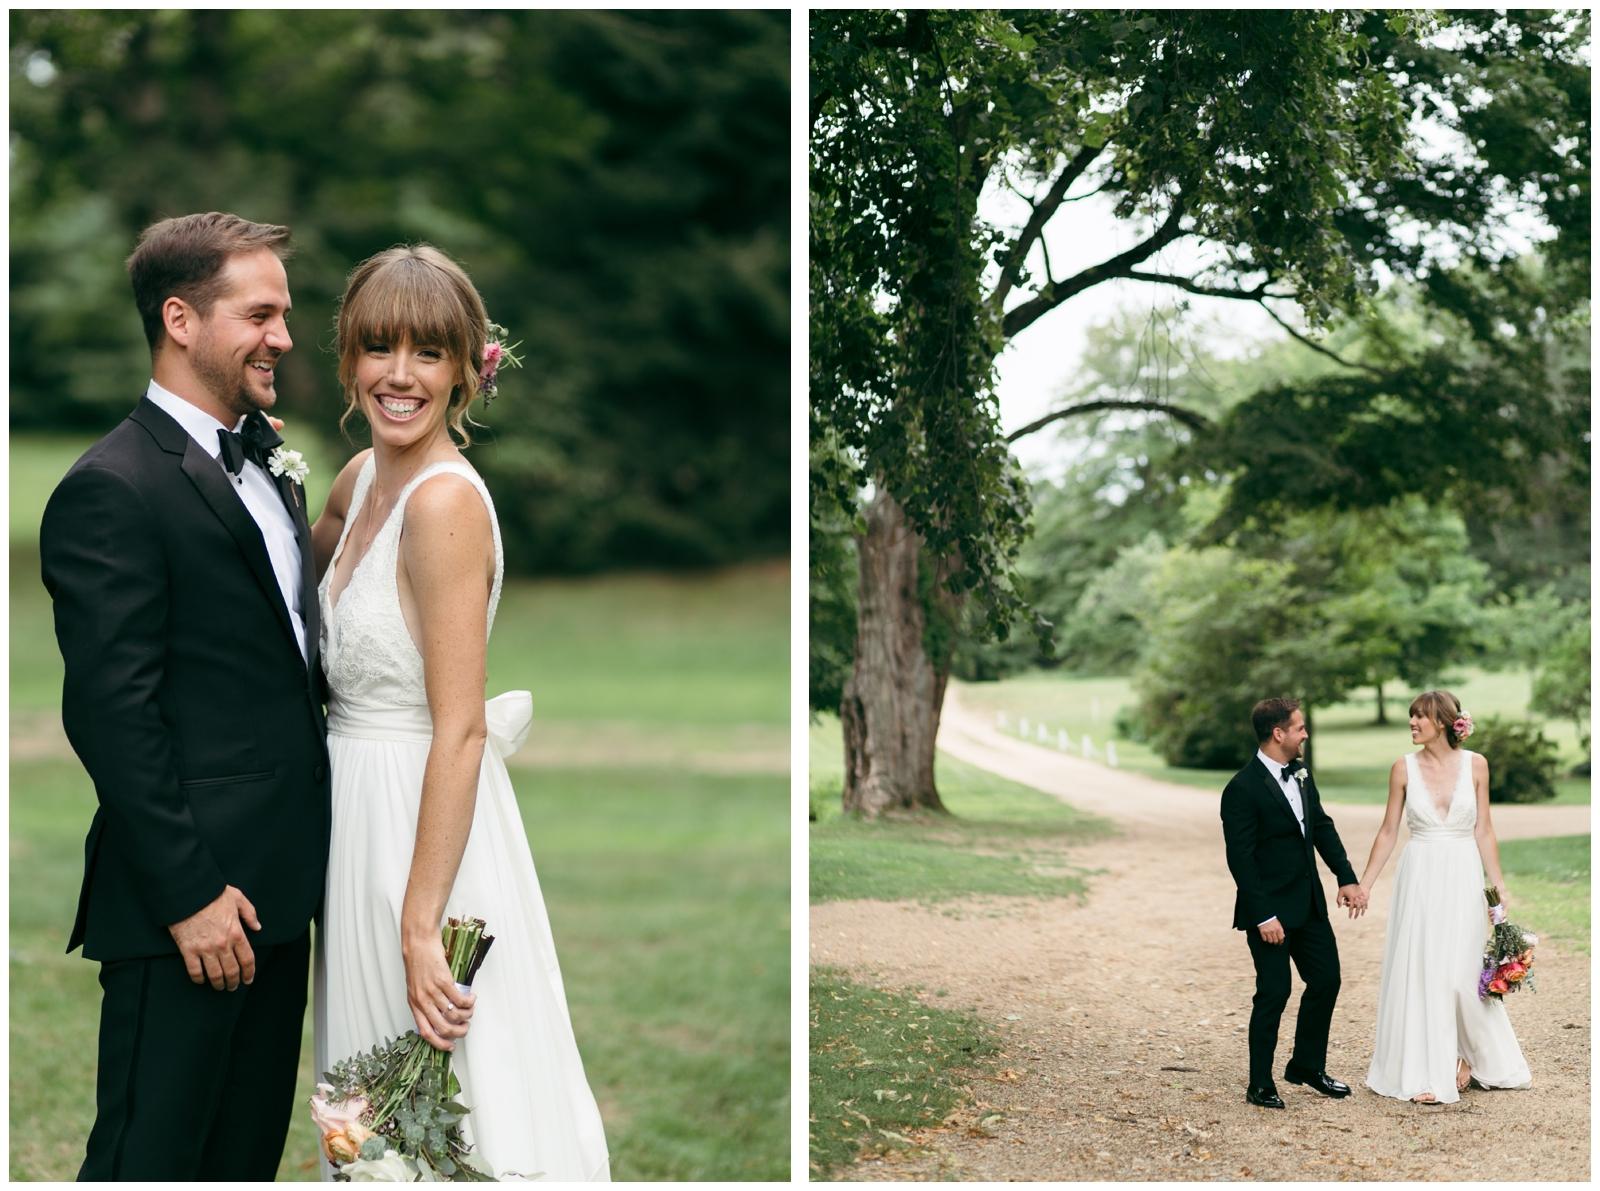 Moraine-Farm-wedding-Bailey-Q-Photo-Massachusetts-wedding-photpgrapher-031.jpg